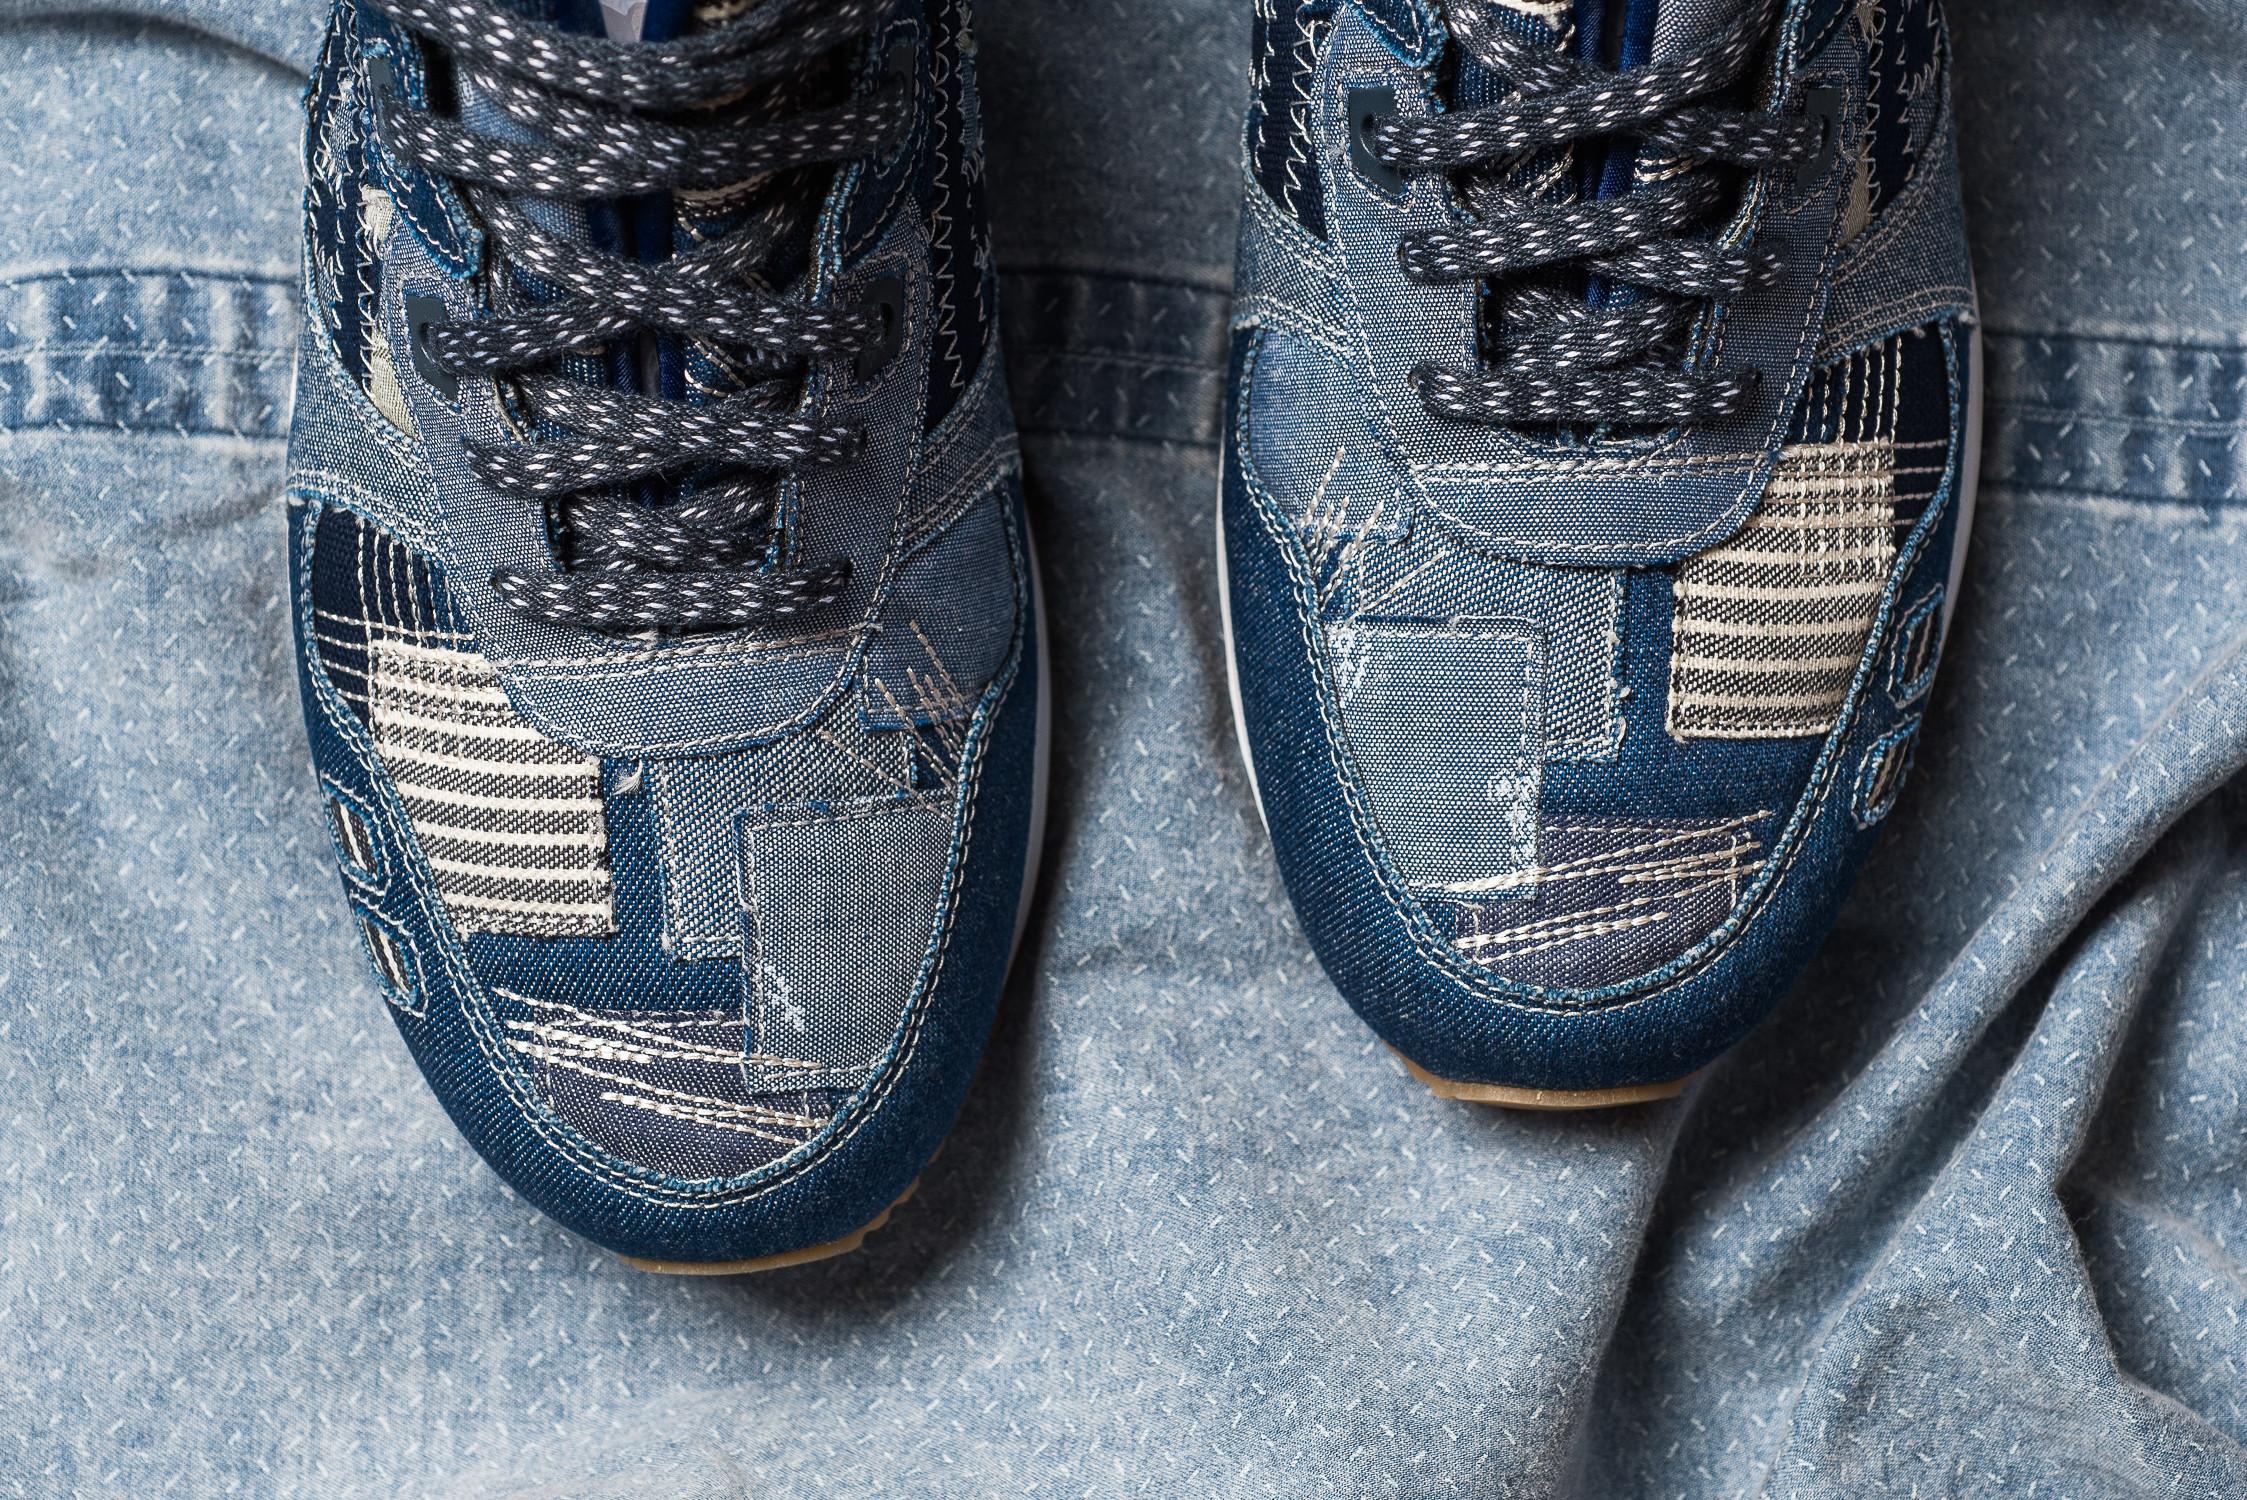 asics gel-lyte iii ranru pack sneaker politics 5